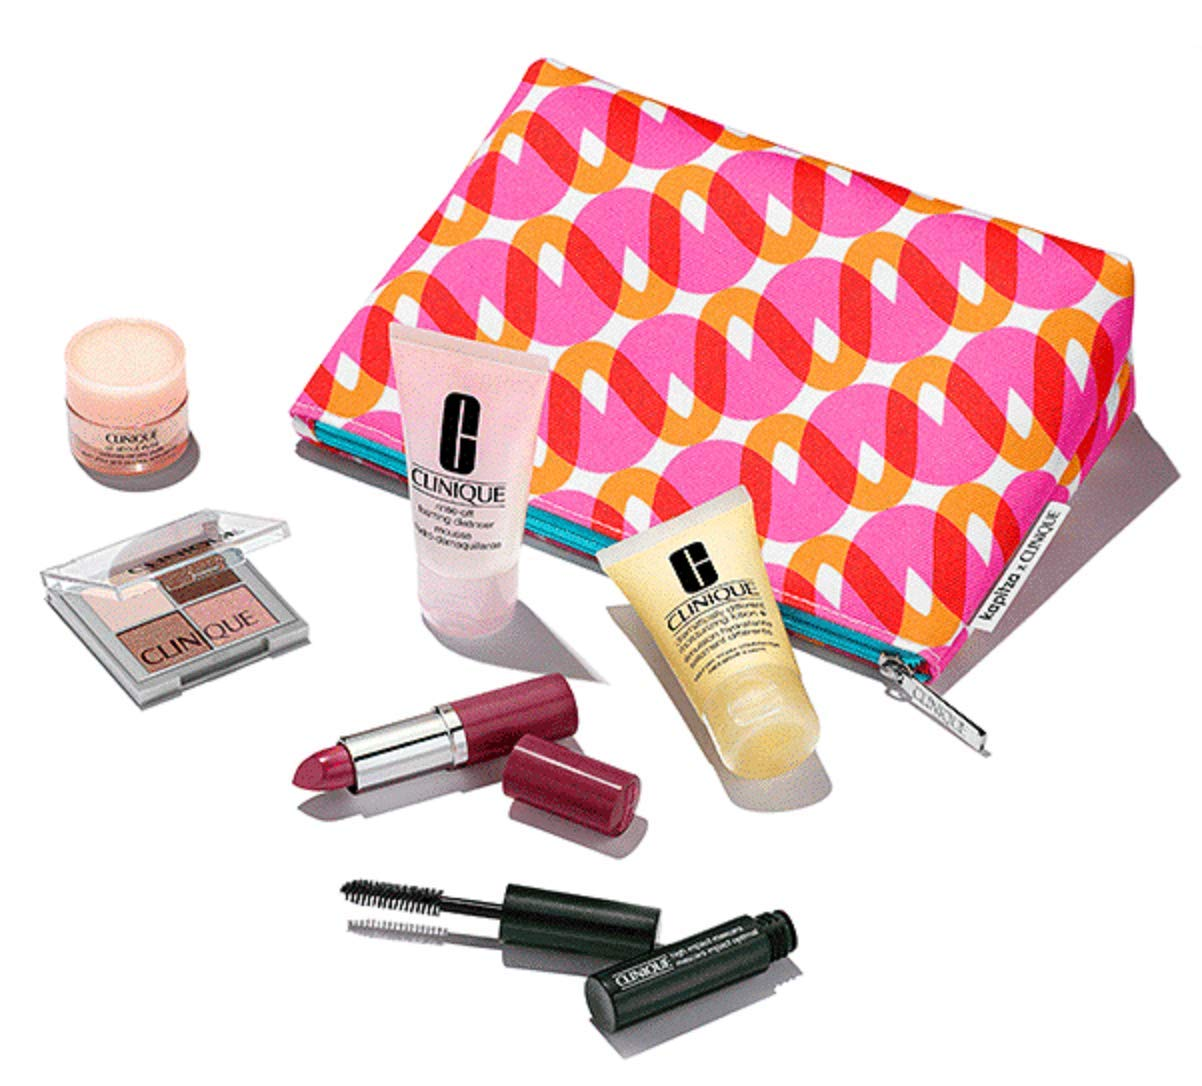 Clinique 7 Pcs 2018 Skincare Gift Set with Pop Lip Colour Primer Full Size in Kapitza Makeup Bag 70 value